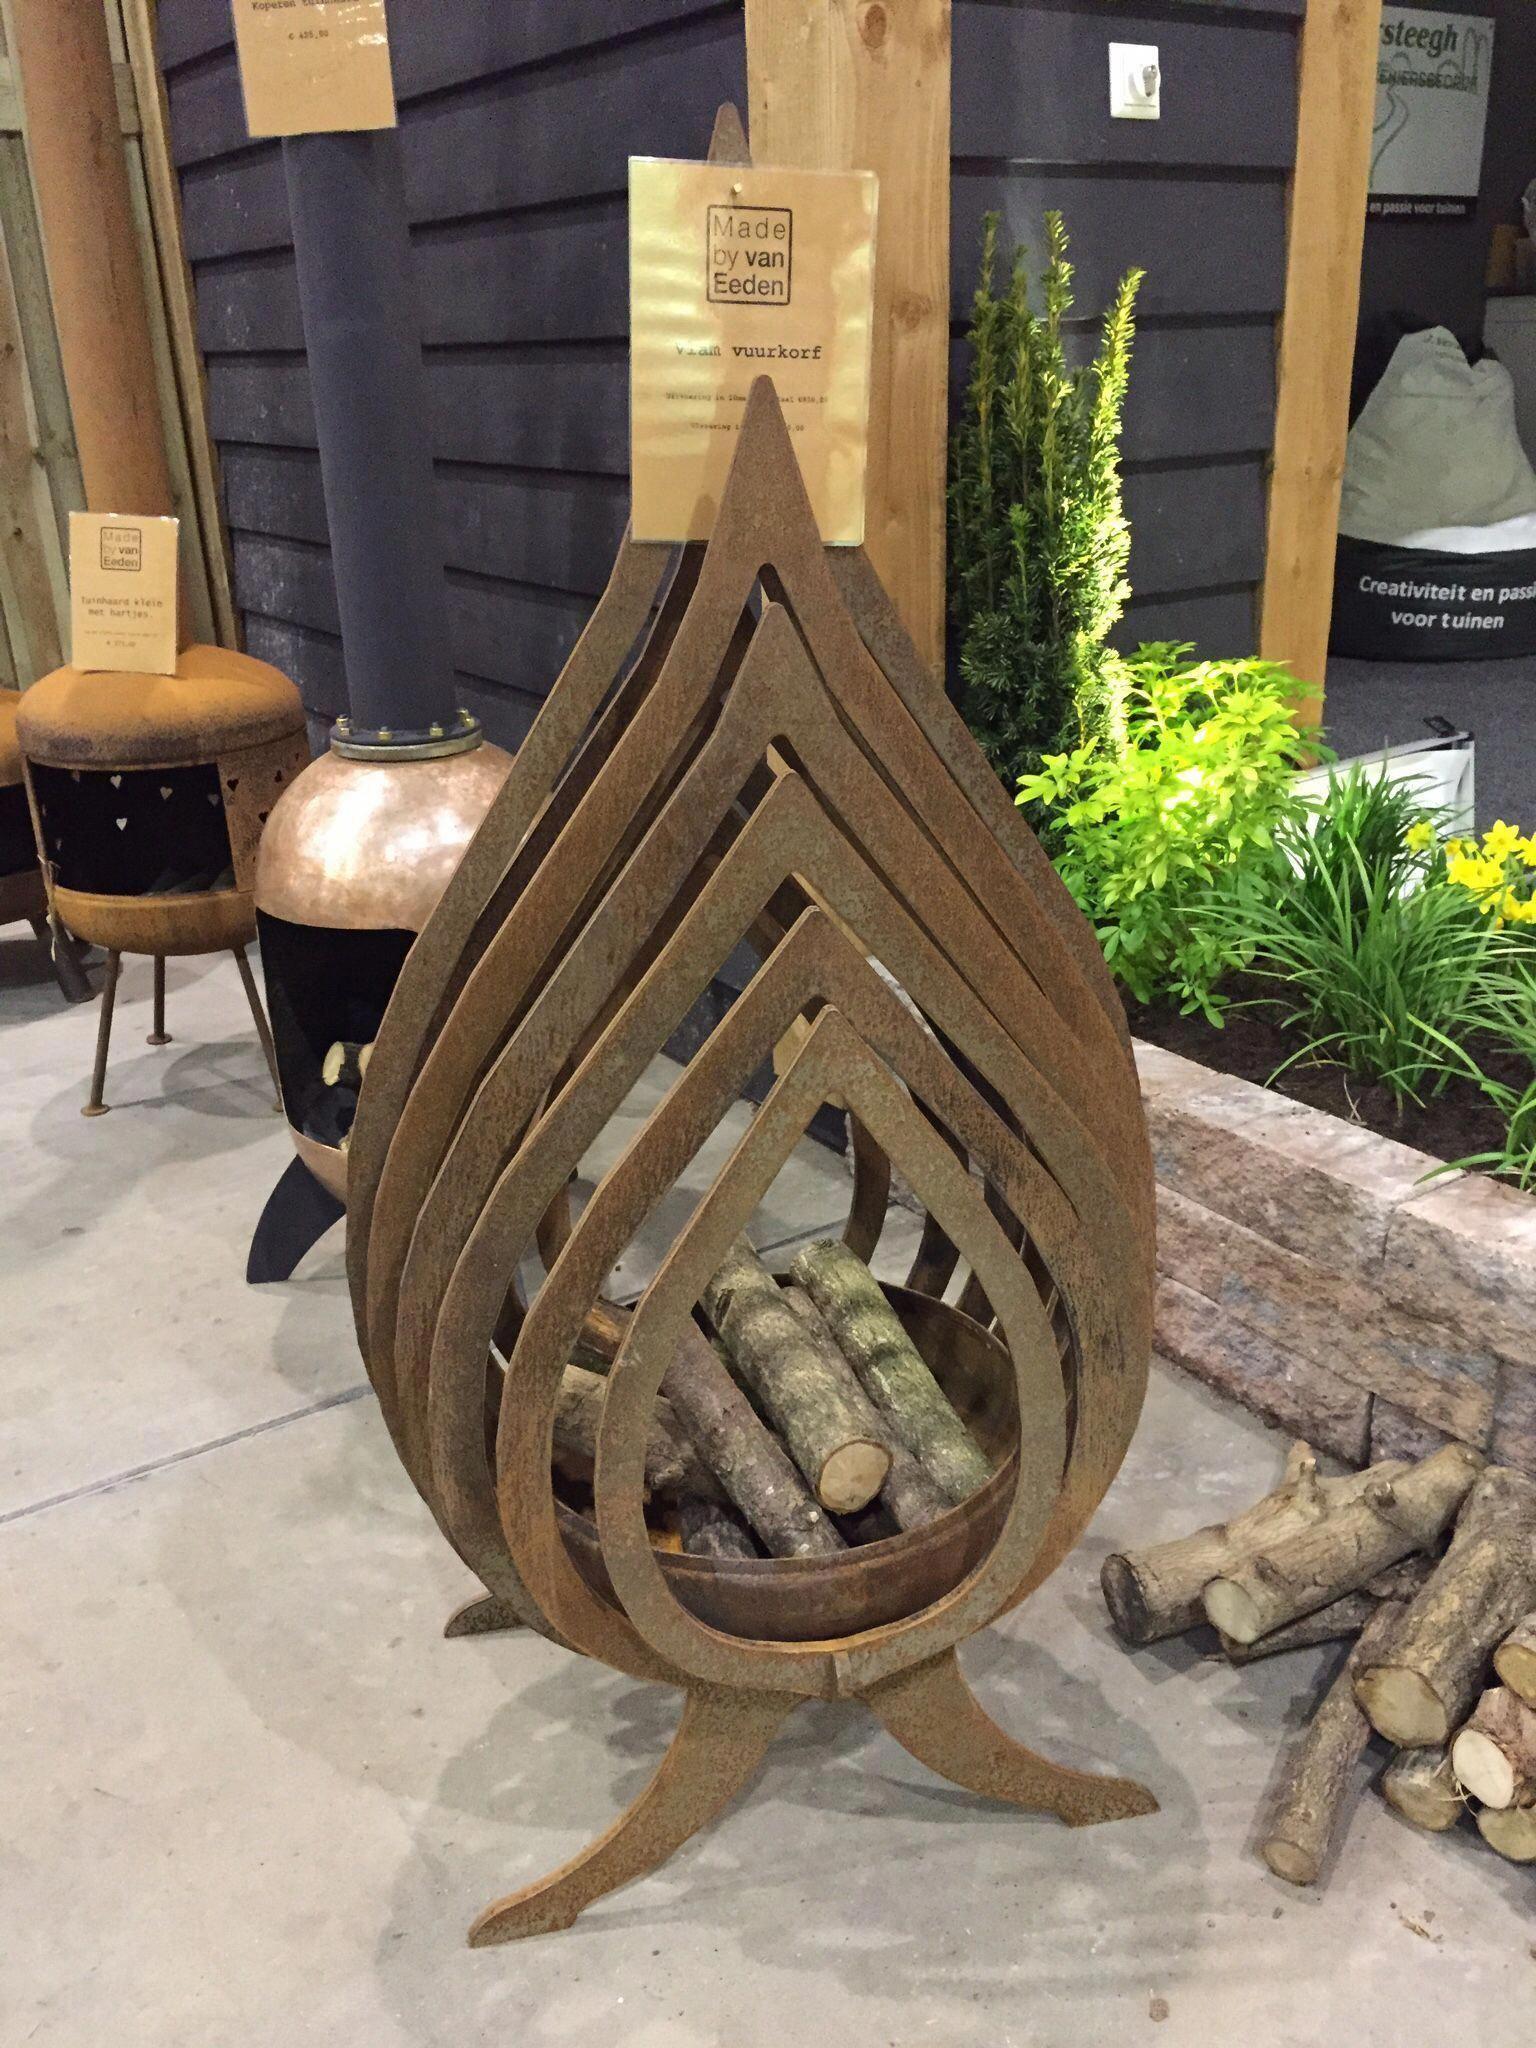 Pin by Анна Алексевна on Steel sculpture in 2020 | Cool ...